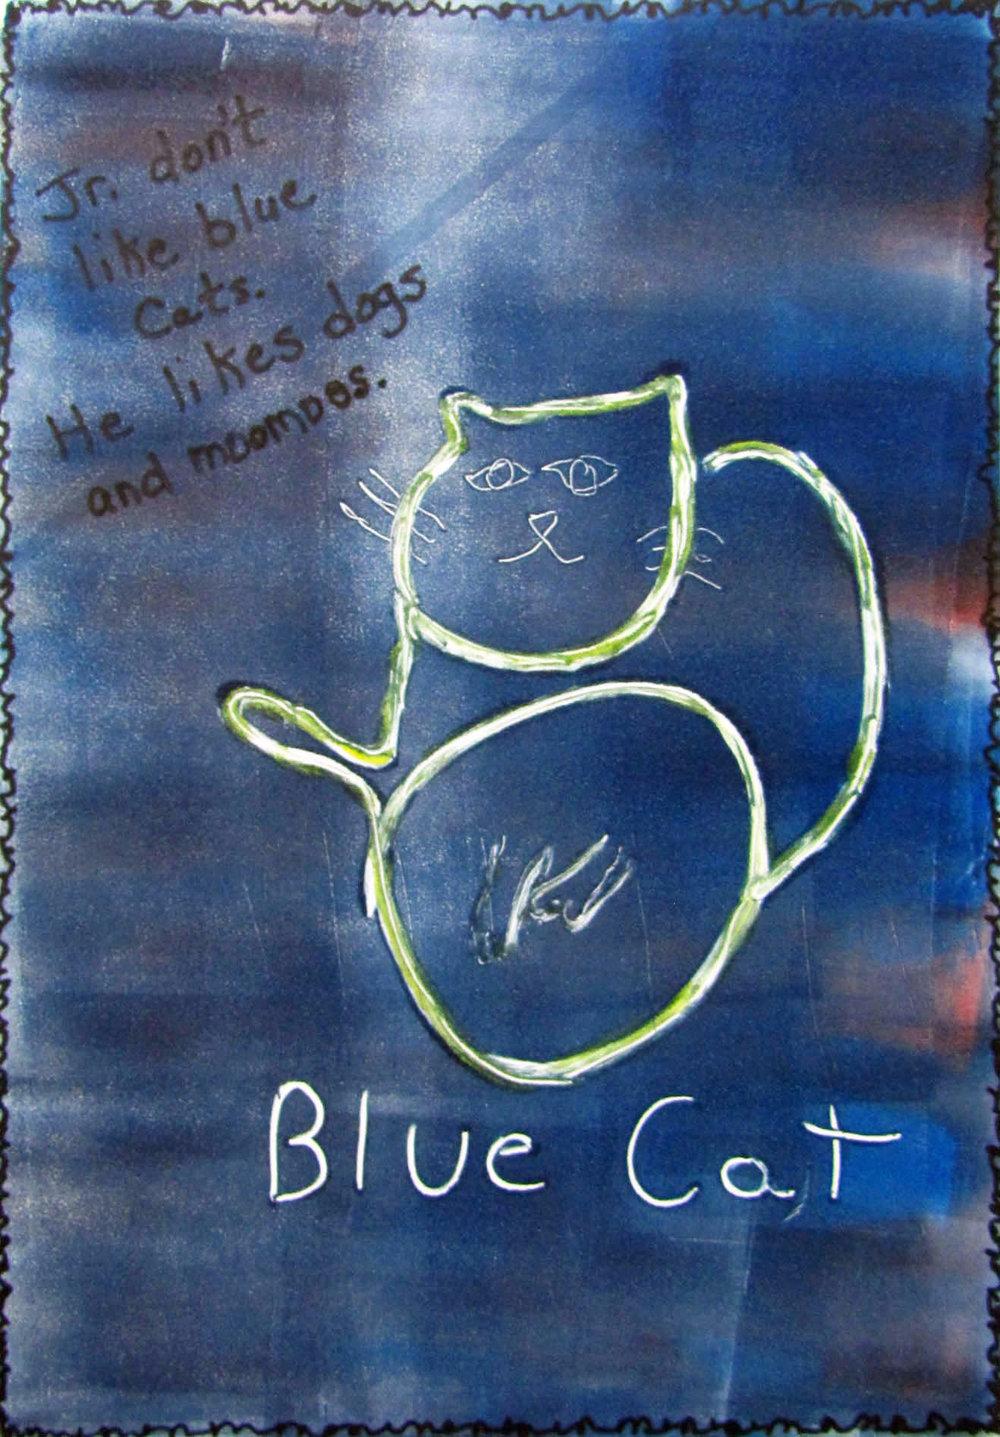 Blue Cat- DWE Williams.jpg